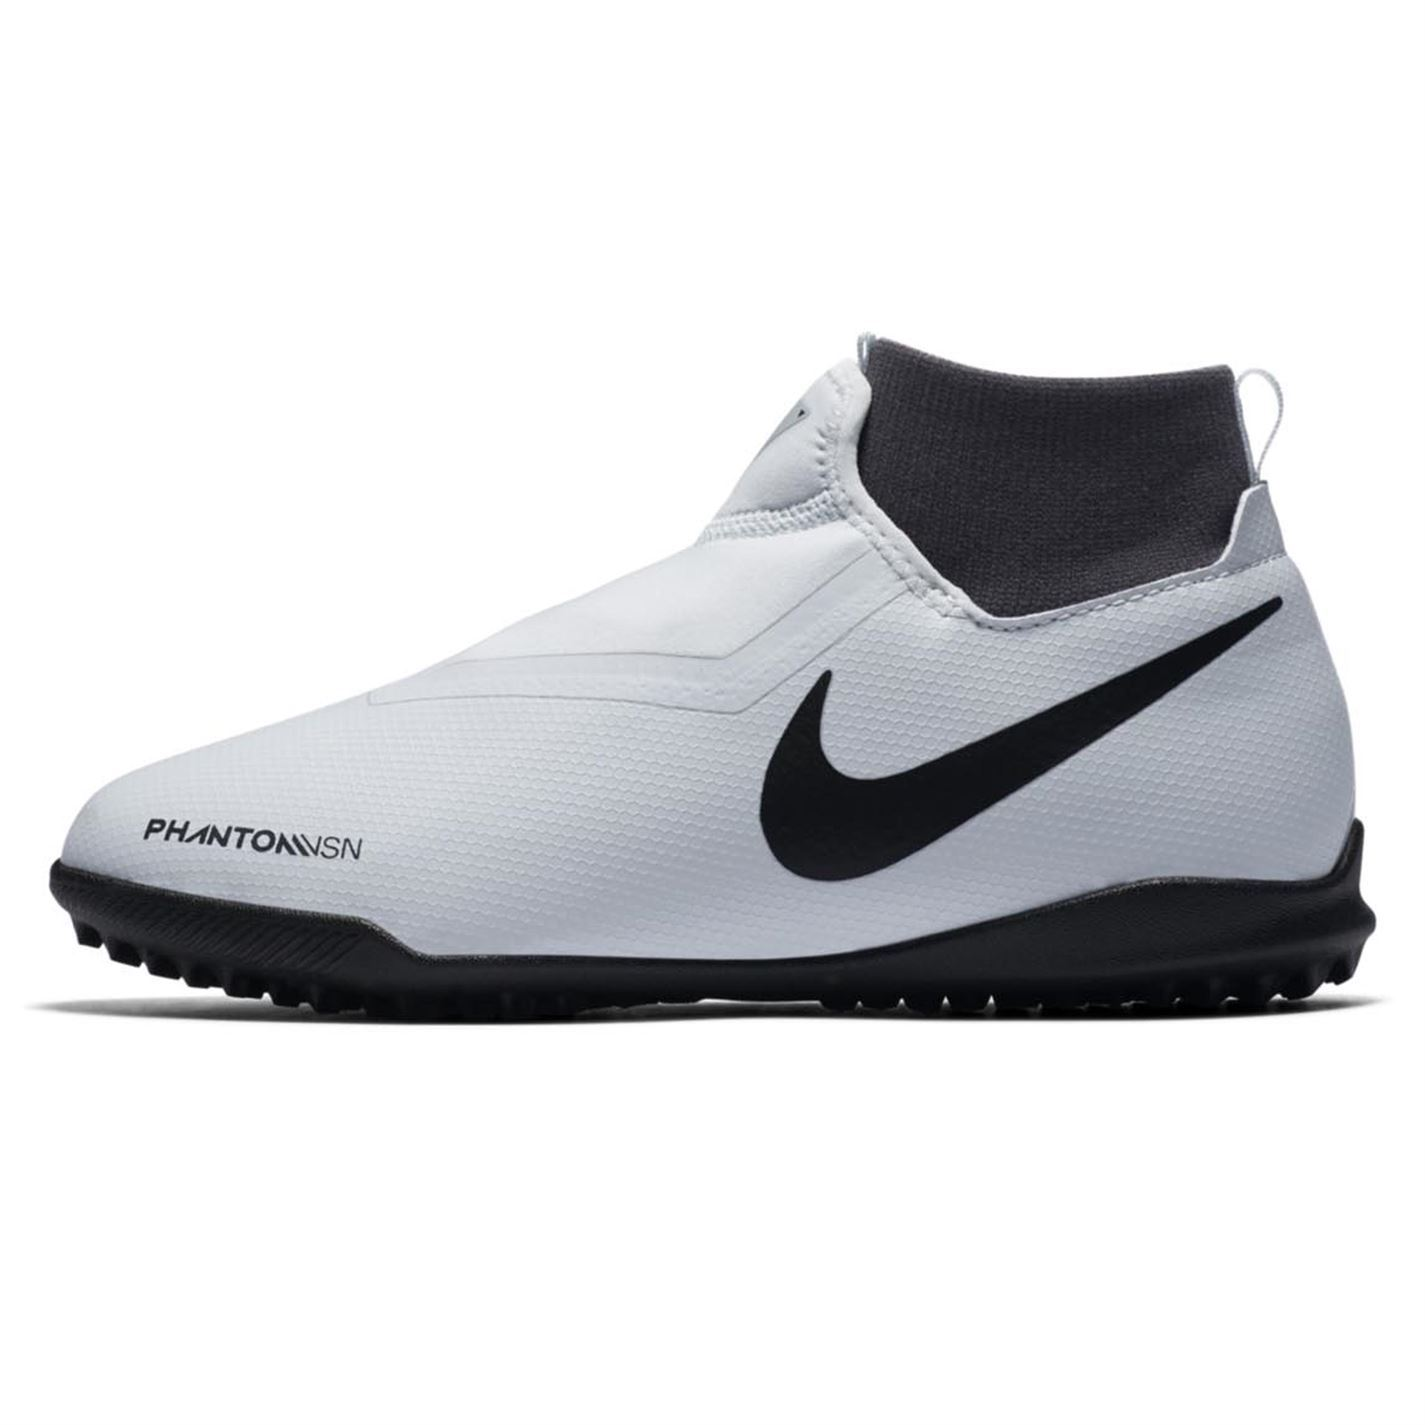 2b91e11a6 ... Nike Phantom Vision Academy DF Astro Turf Football Trainers Juniors  Soccer Shoes